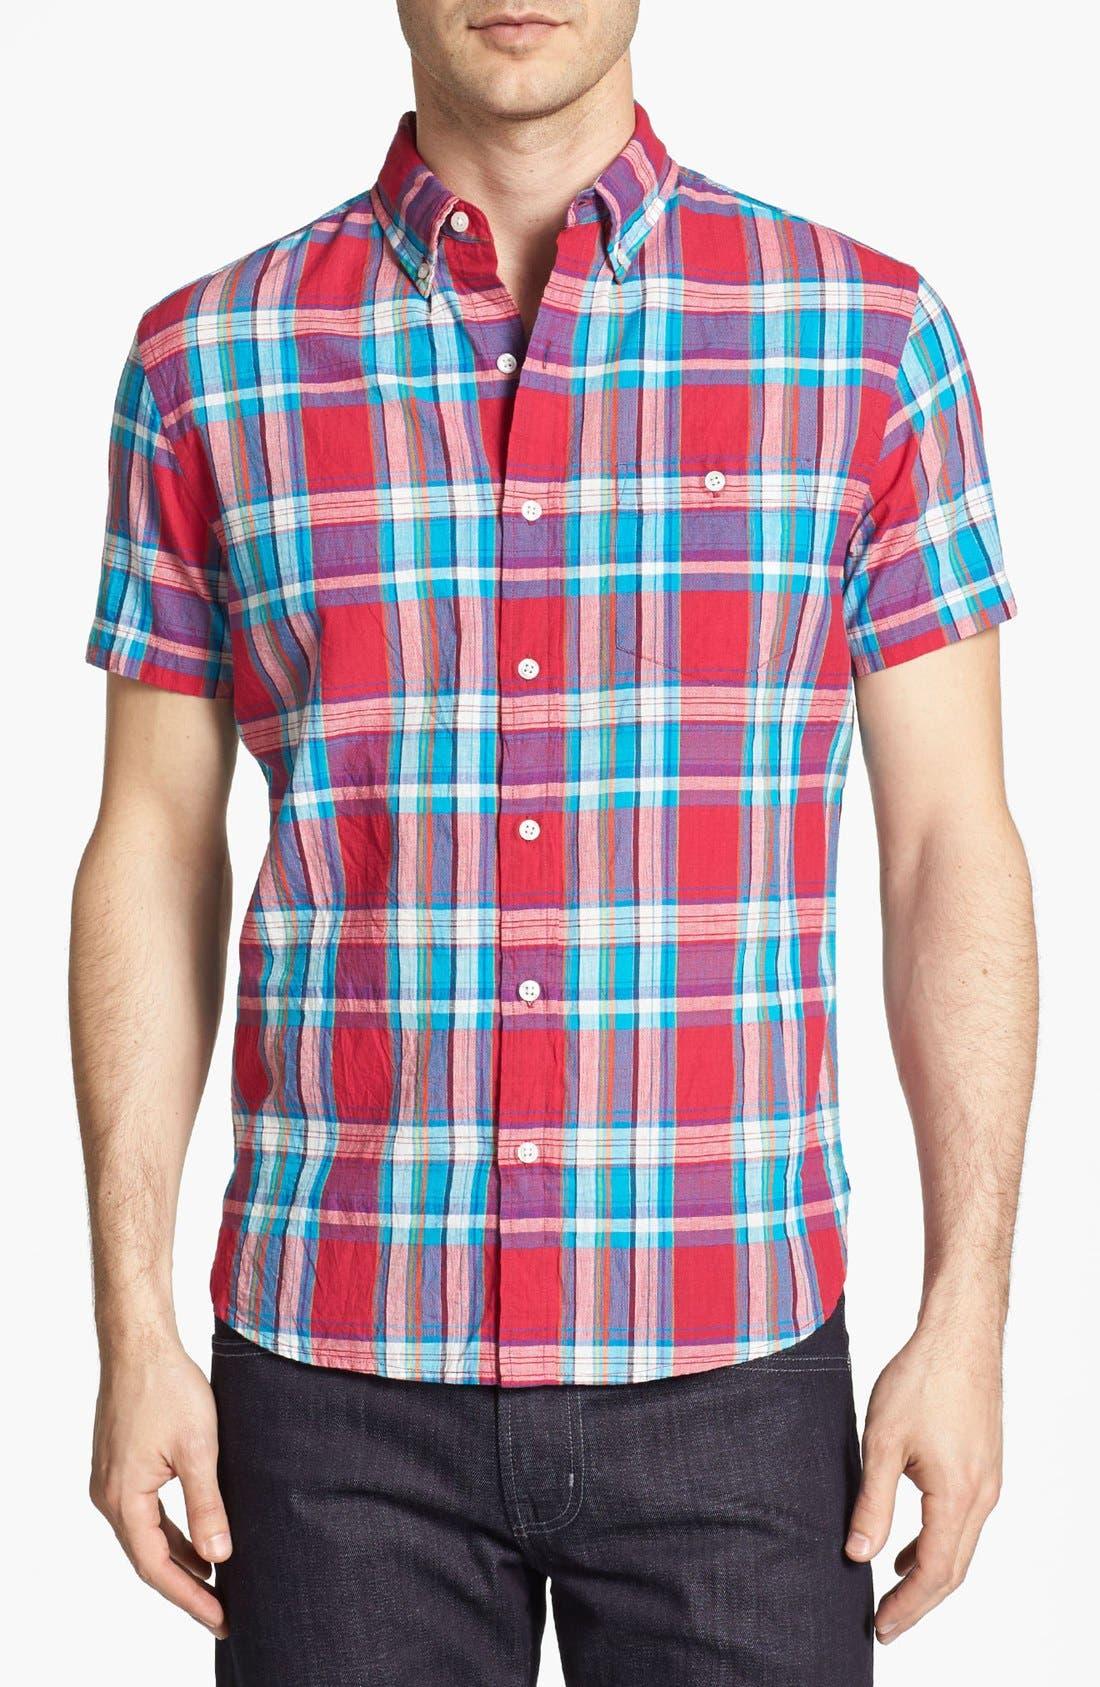 Main Image - Bonobos Madras Plaid Standard Fit Short Sleeve Sport Shirt